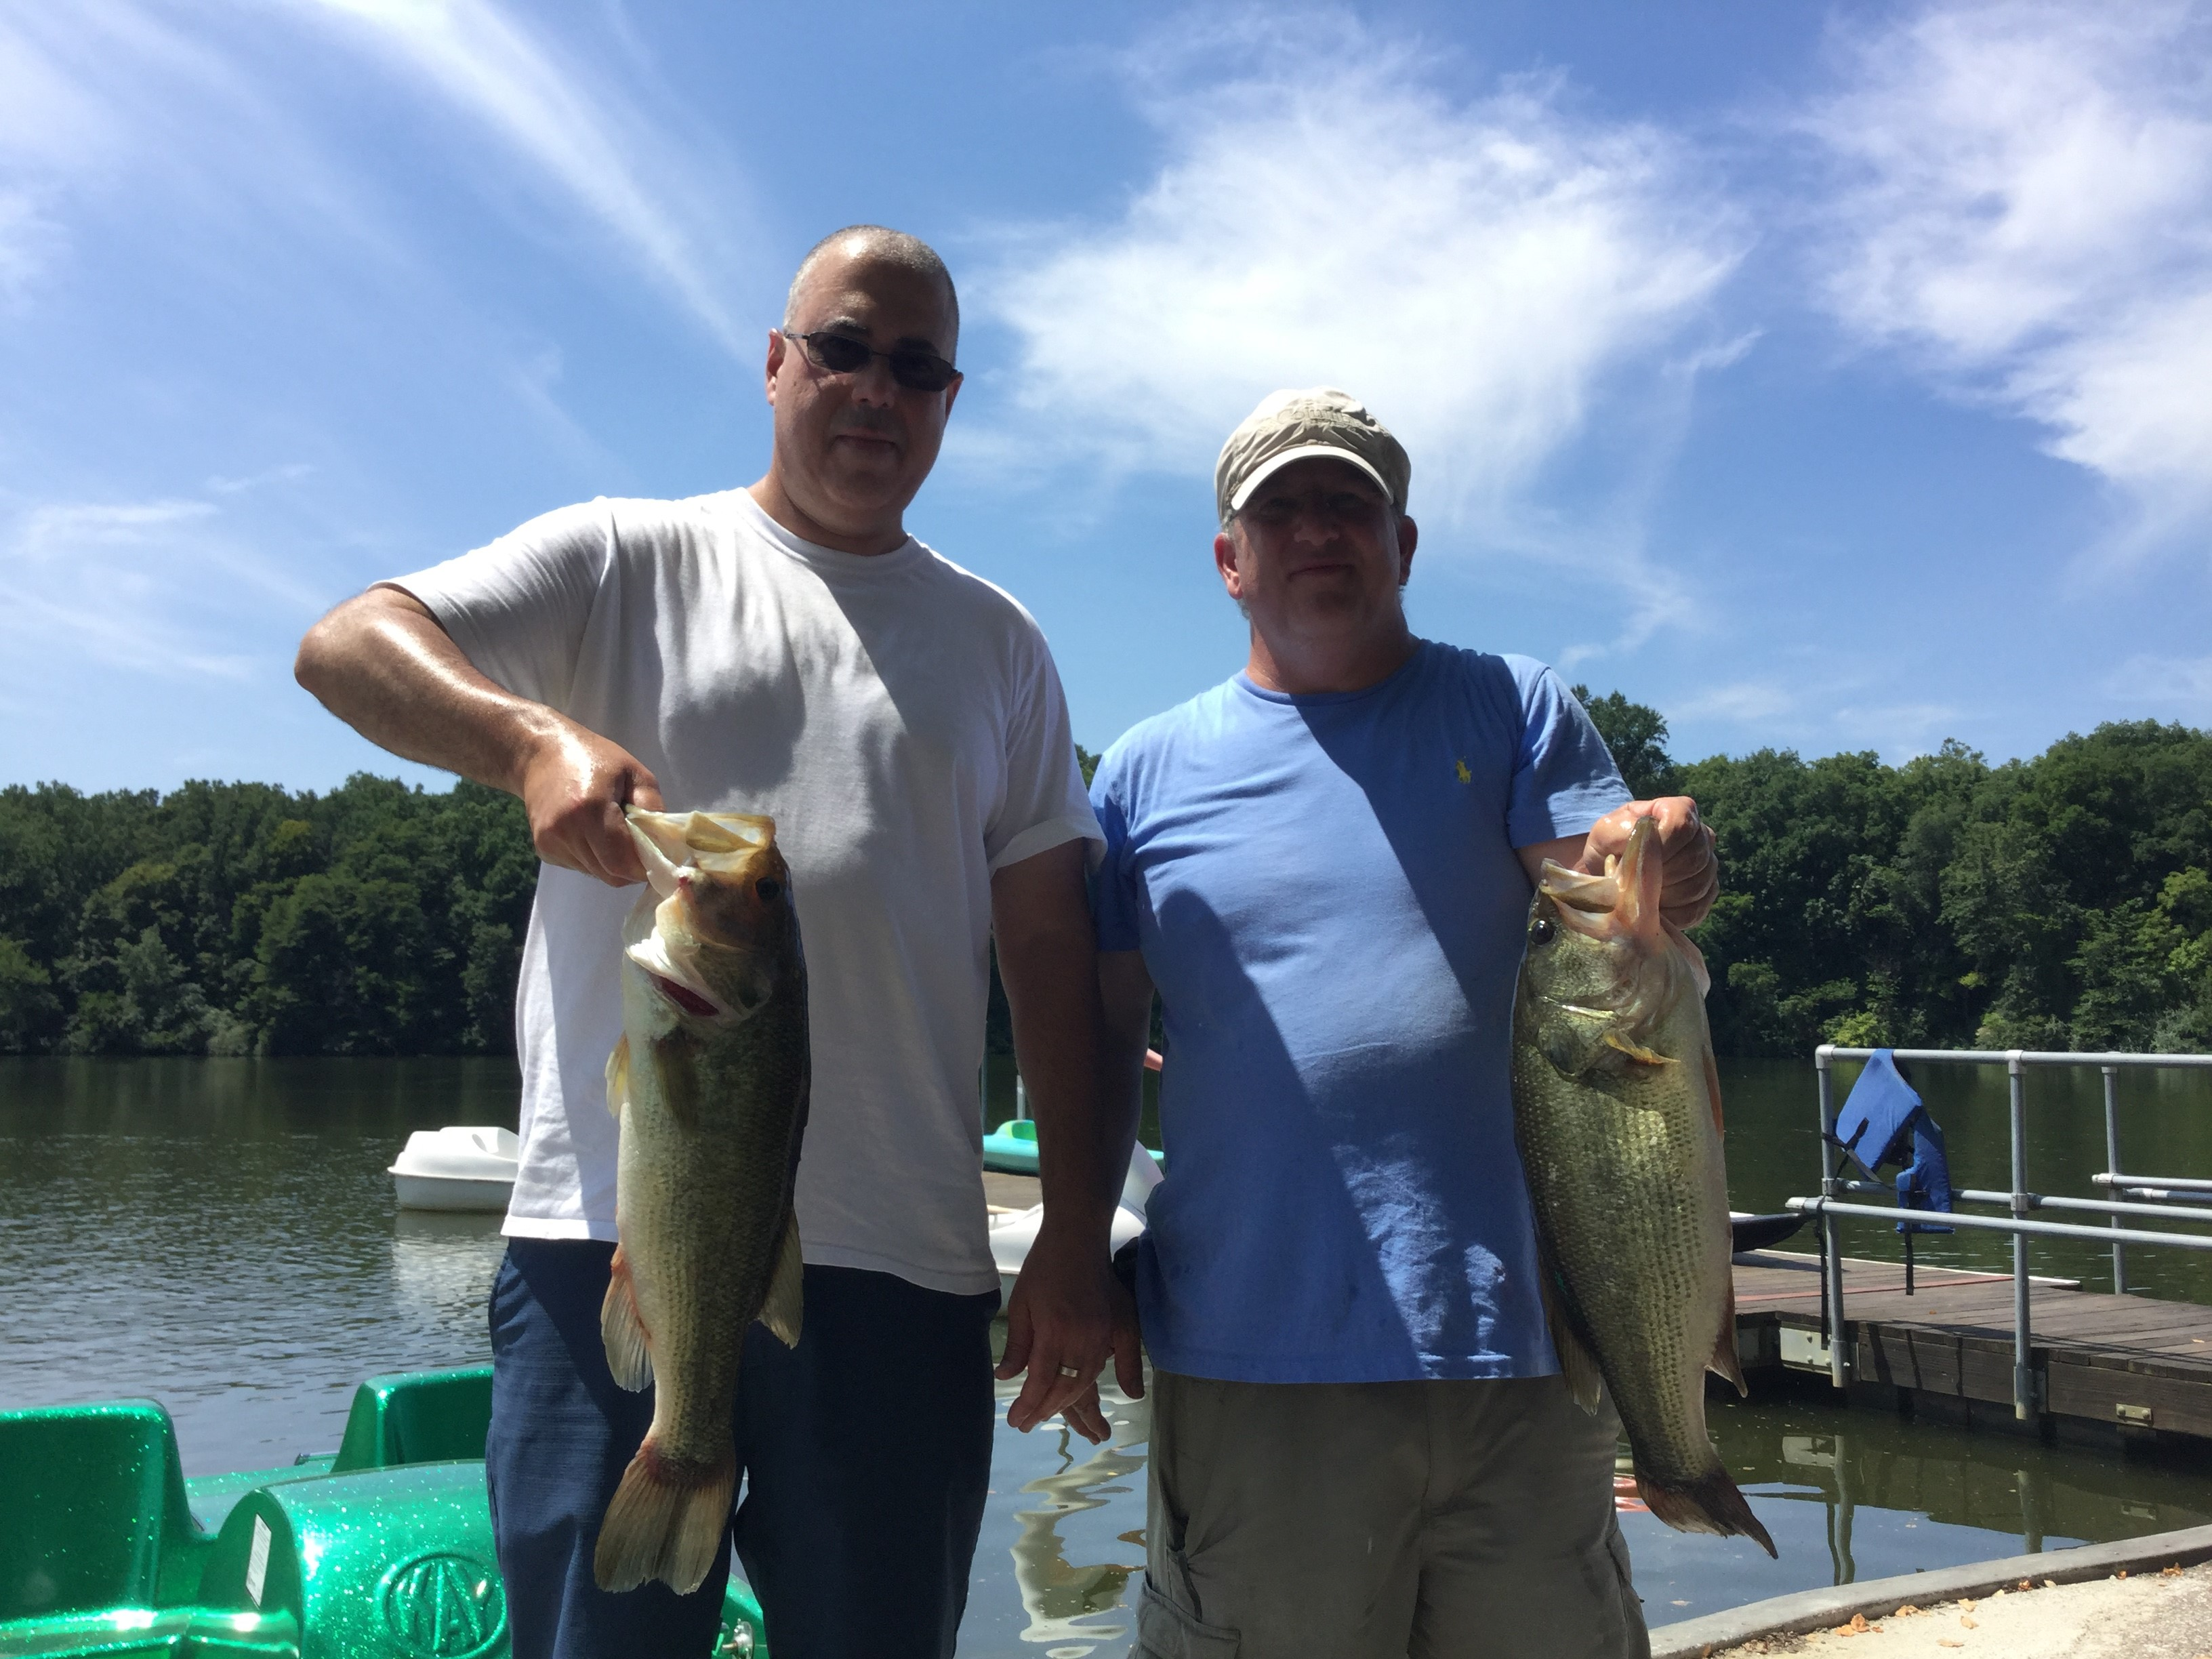 August 3 Bass Series Julio Delgado and Paul Regensburger